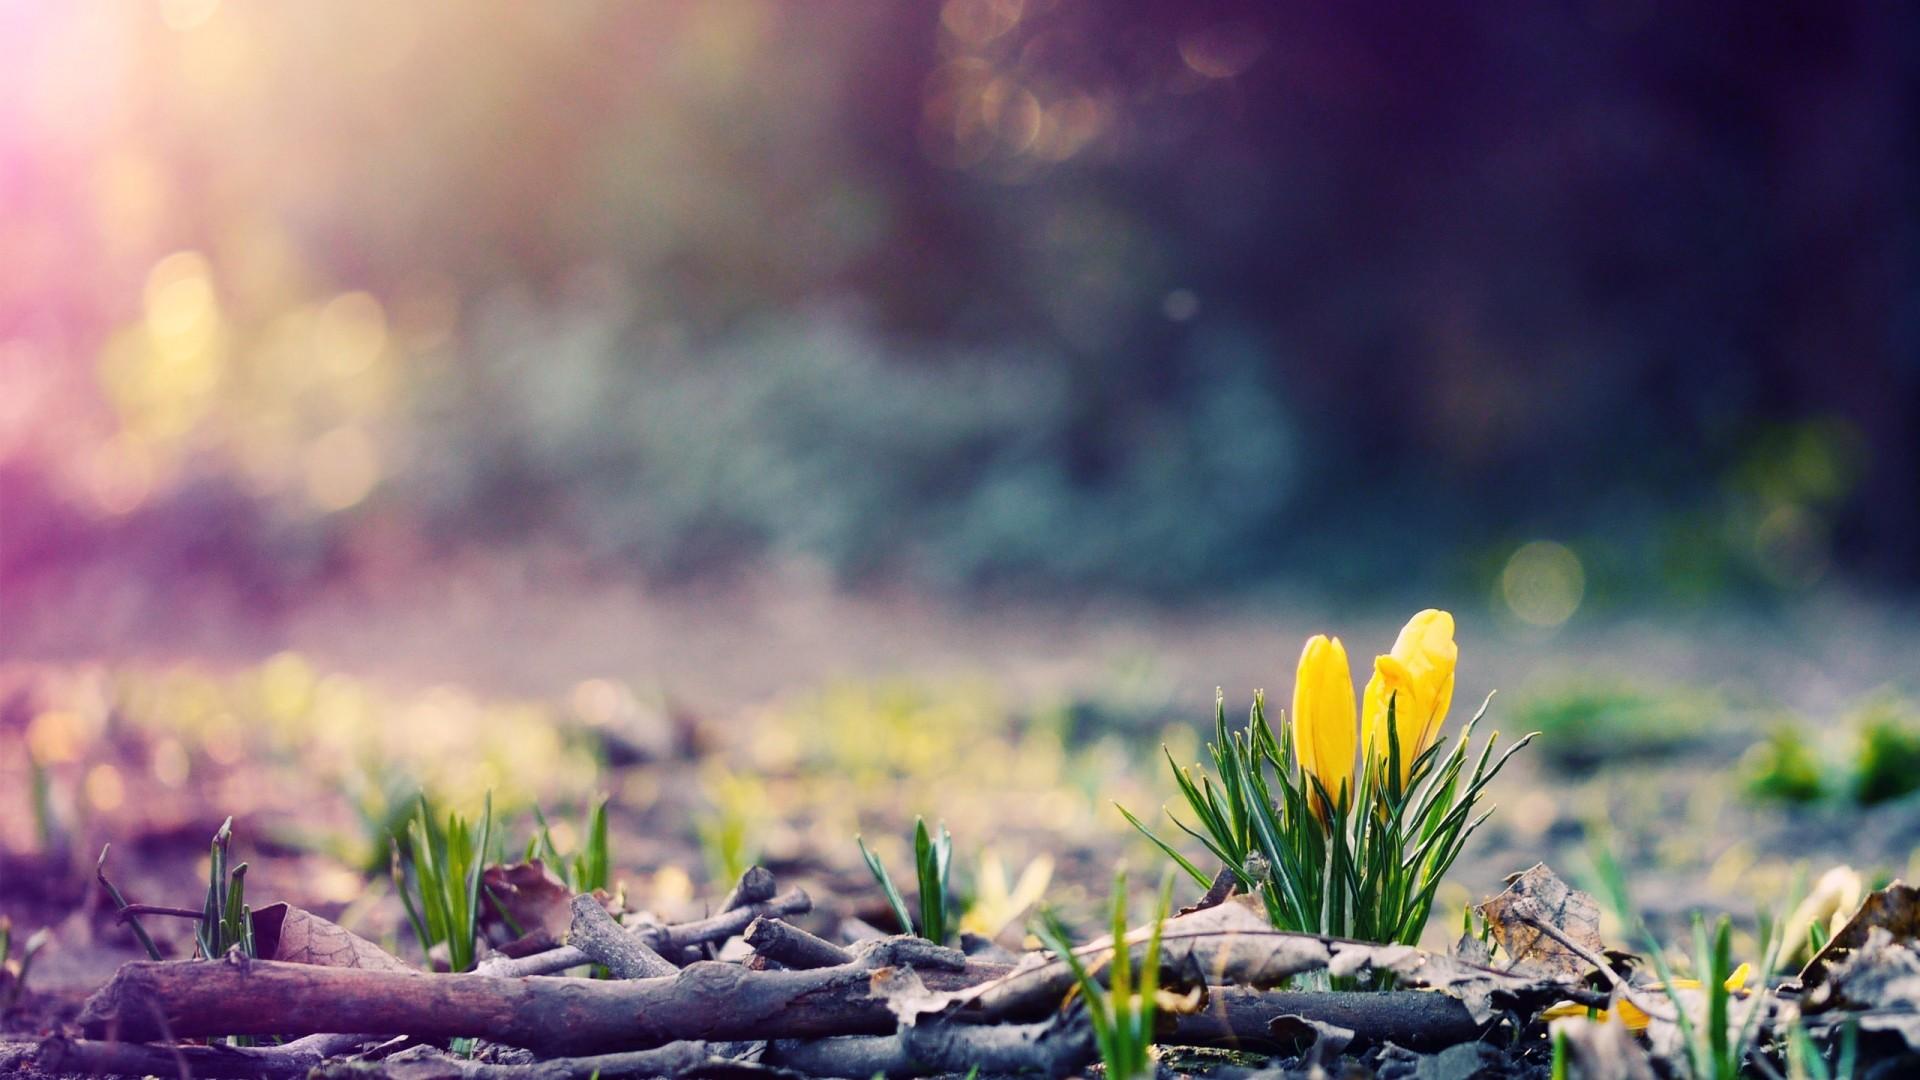 Spring 1080p Background Wallpaper